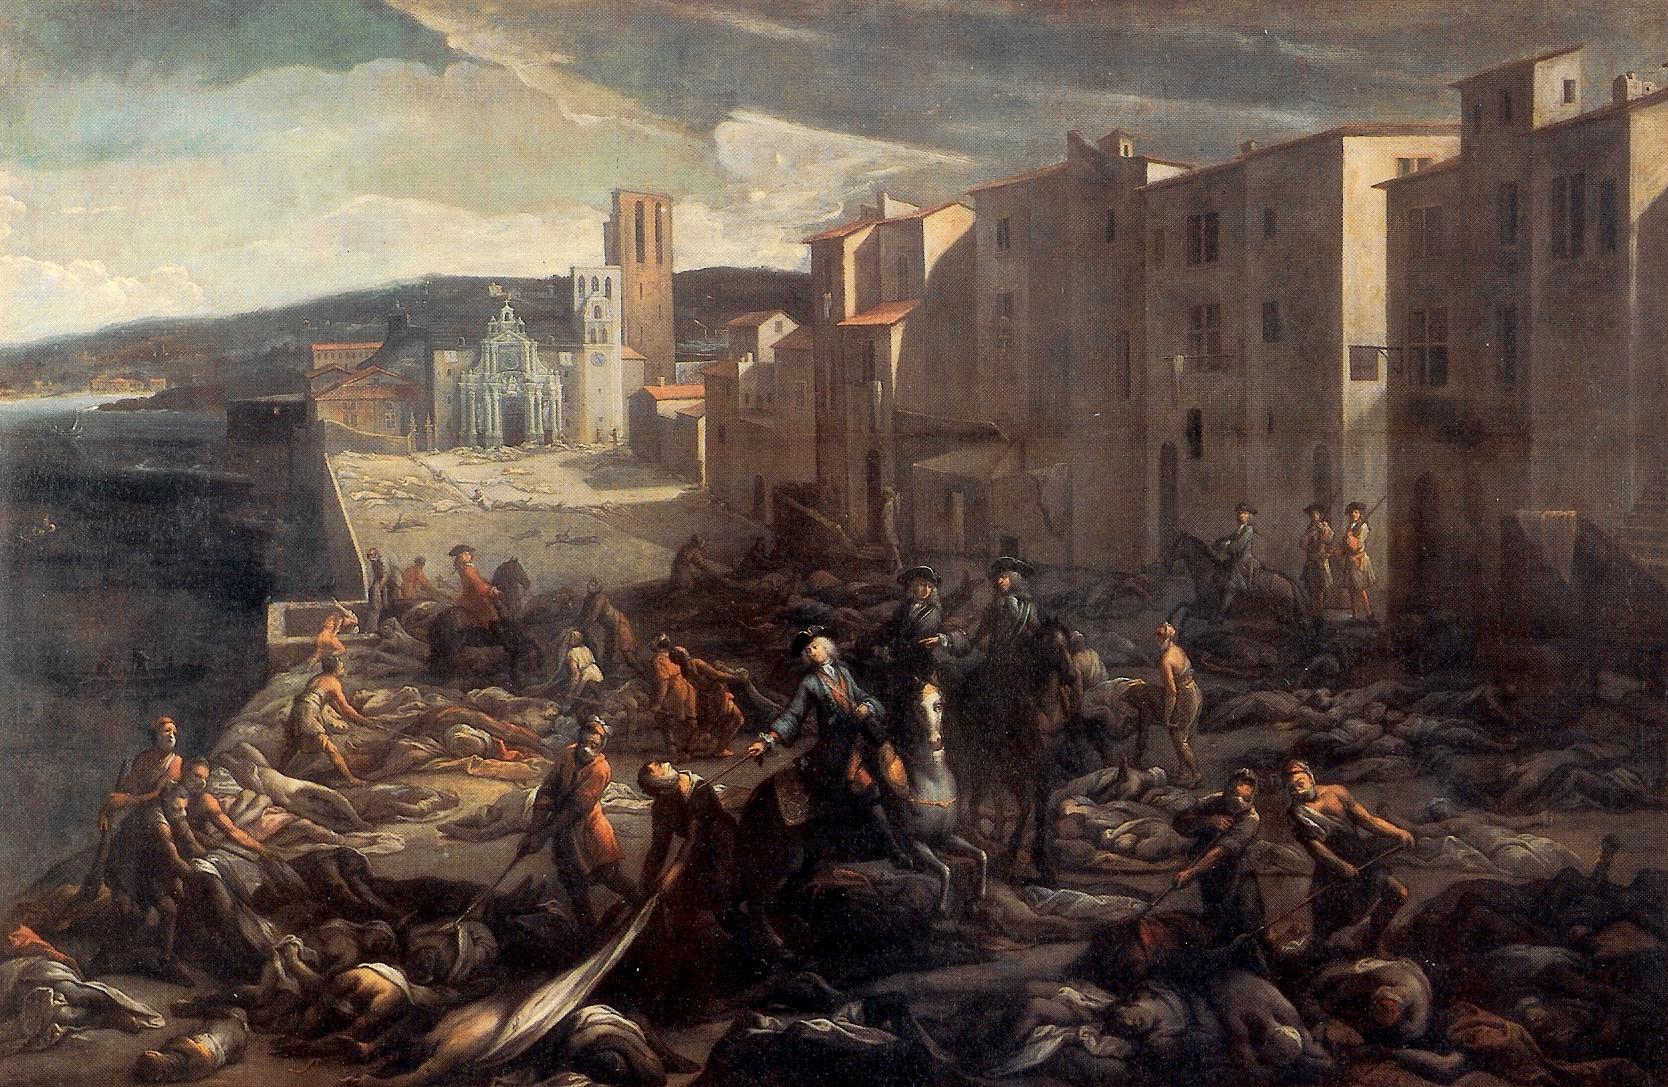 Scène de la peste de 1720 à la Tourette (Marseille), tableau de Michel Serre .